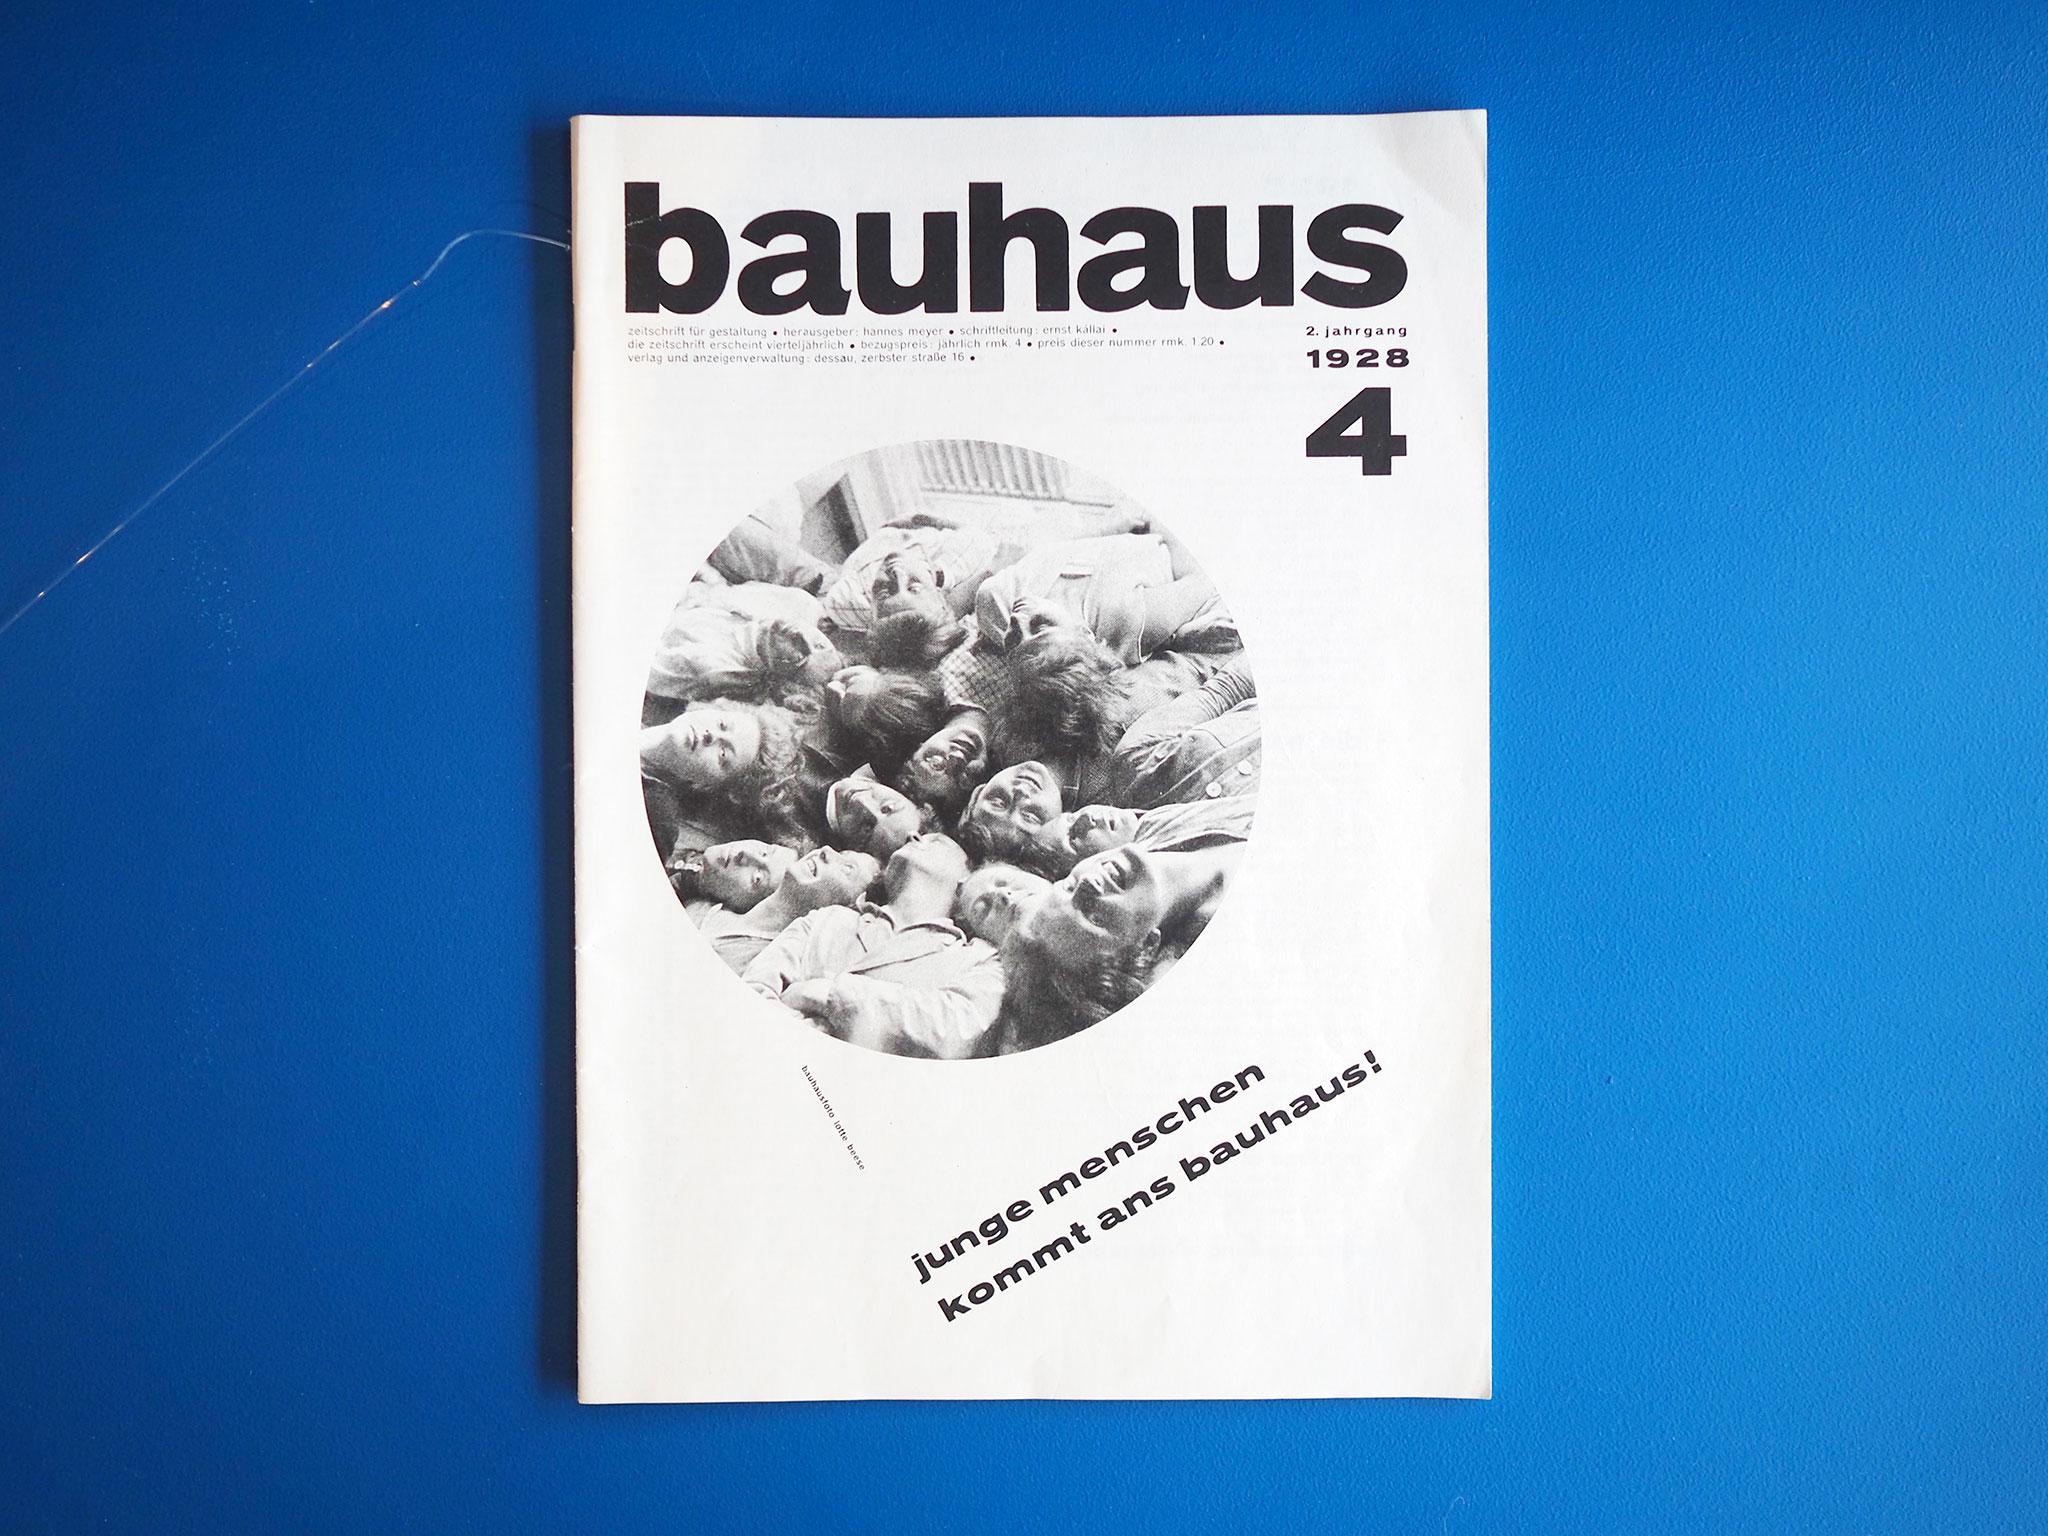 bauhaus-imaginista-slanted-moscow_14